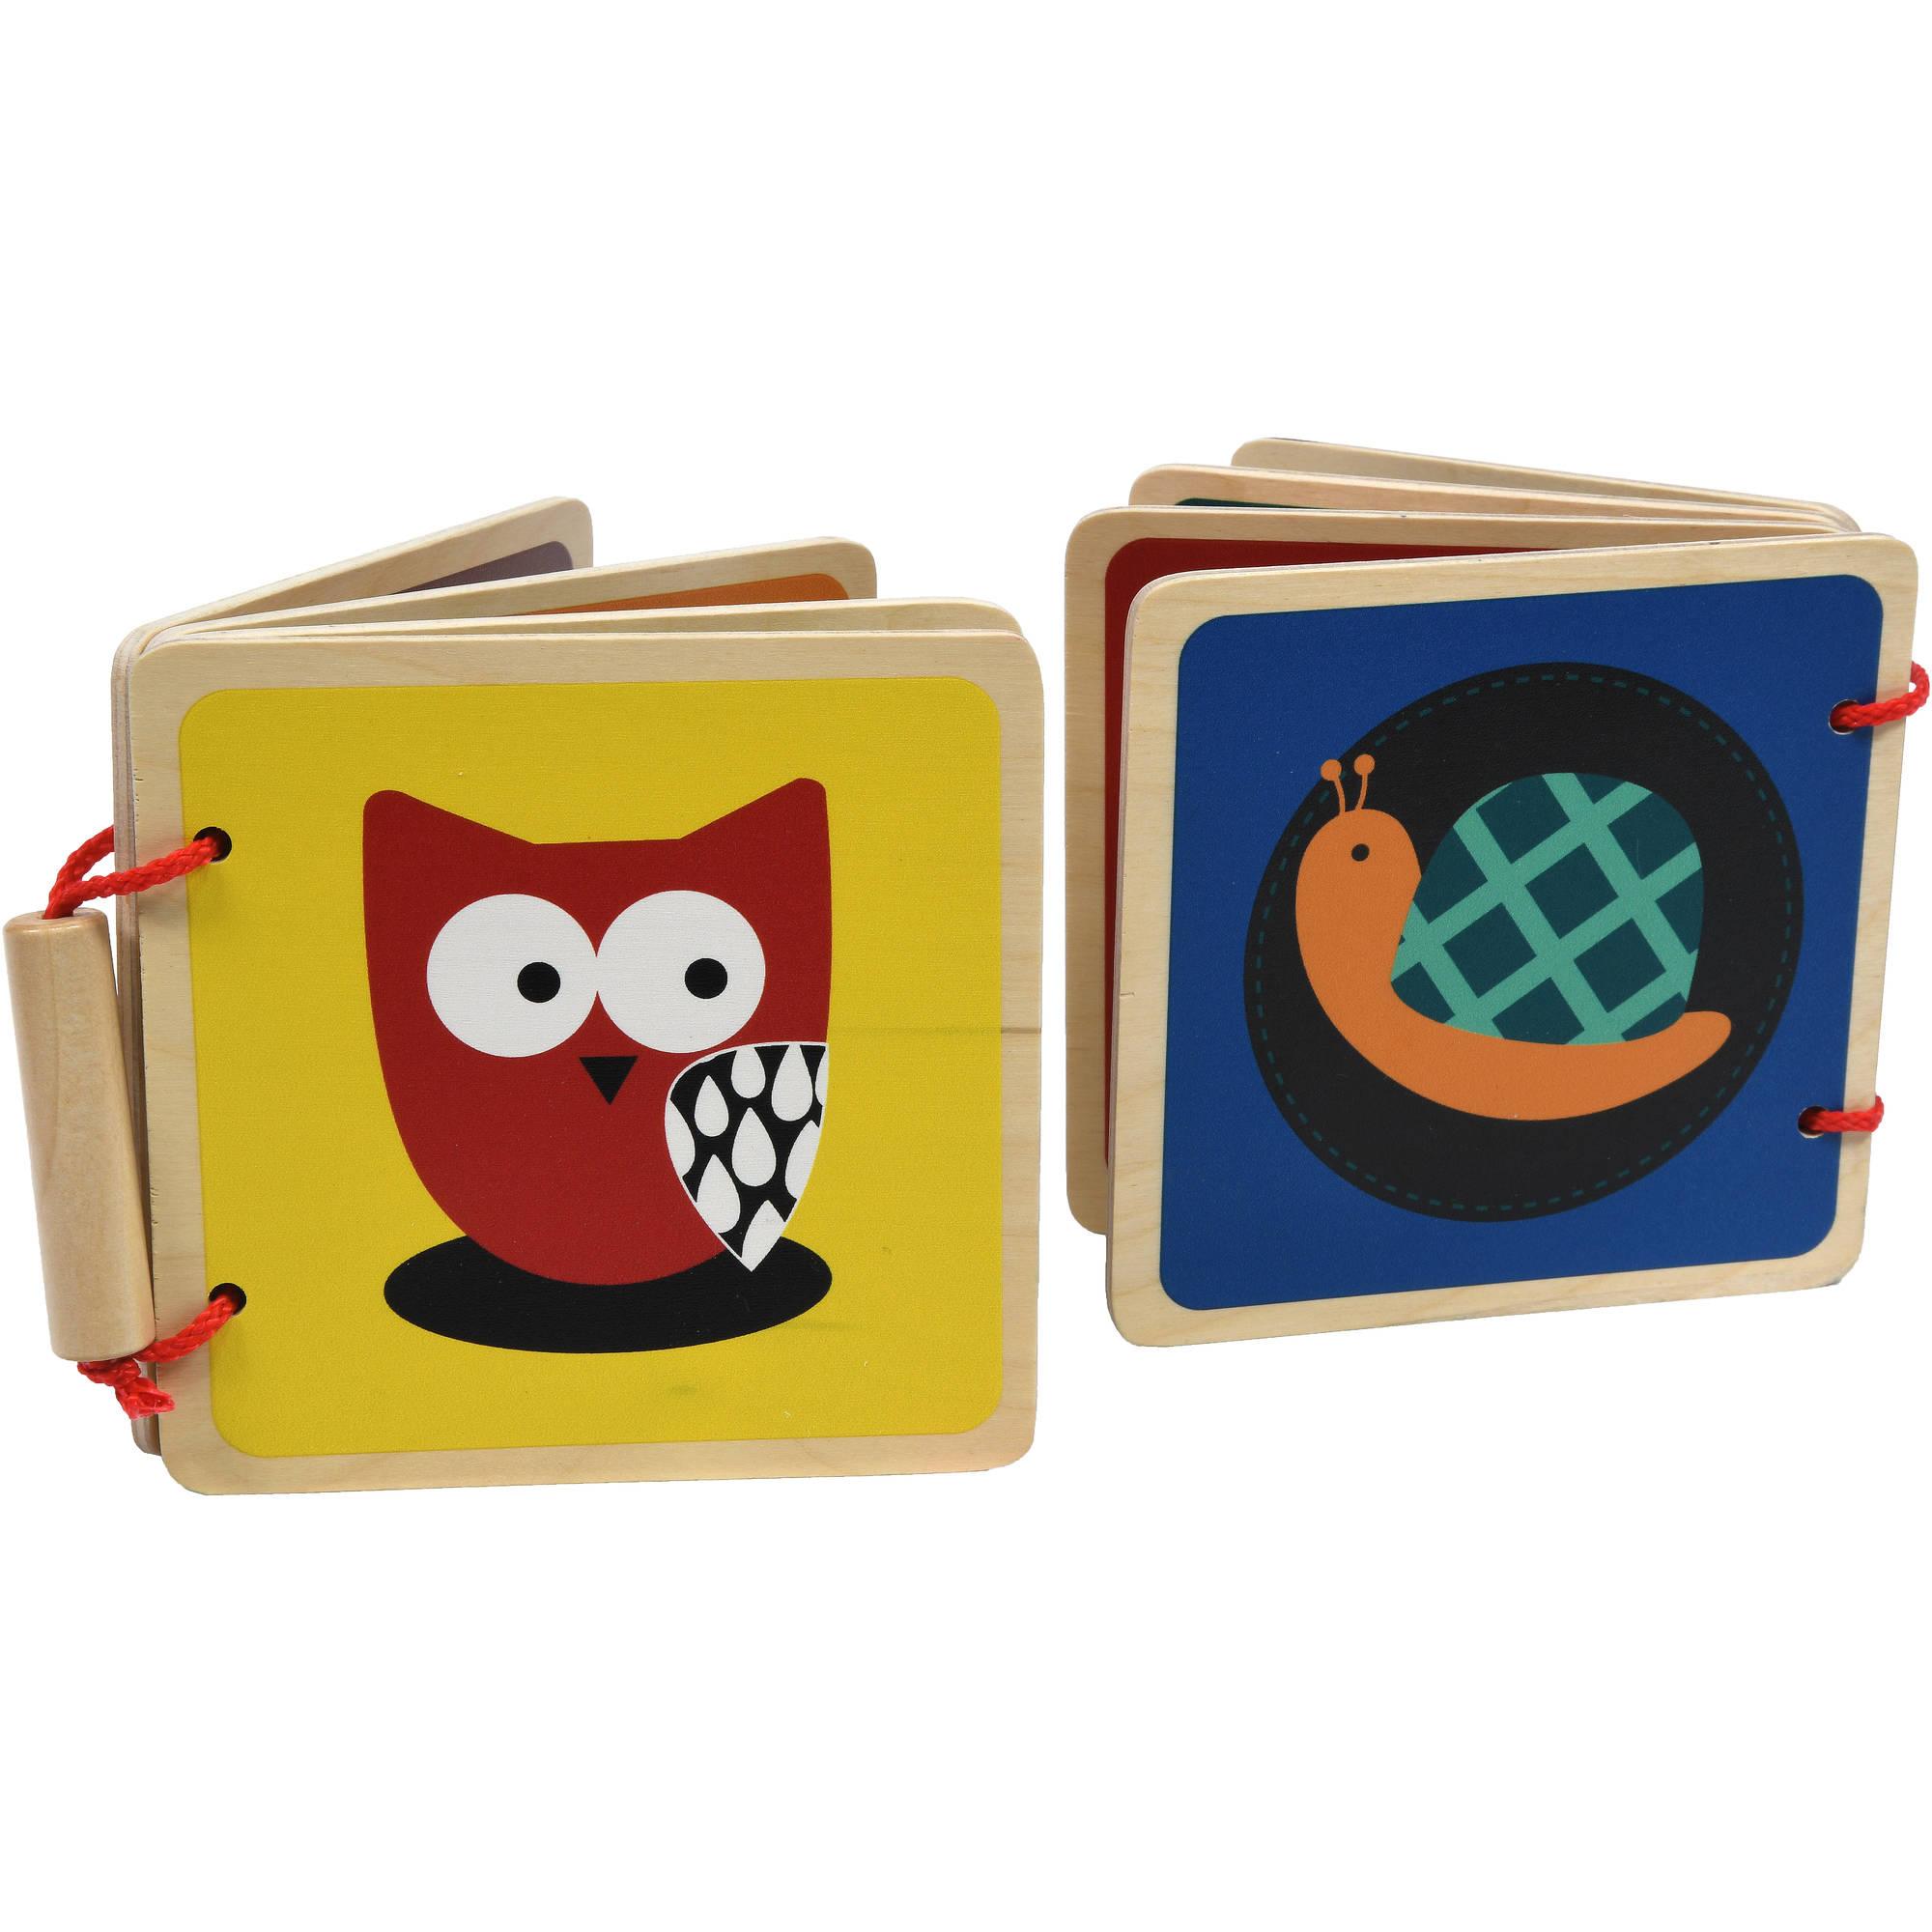 Spark Create Imagine Wooden Books, 2 pieces